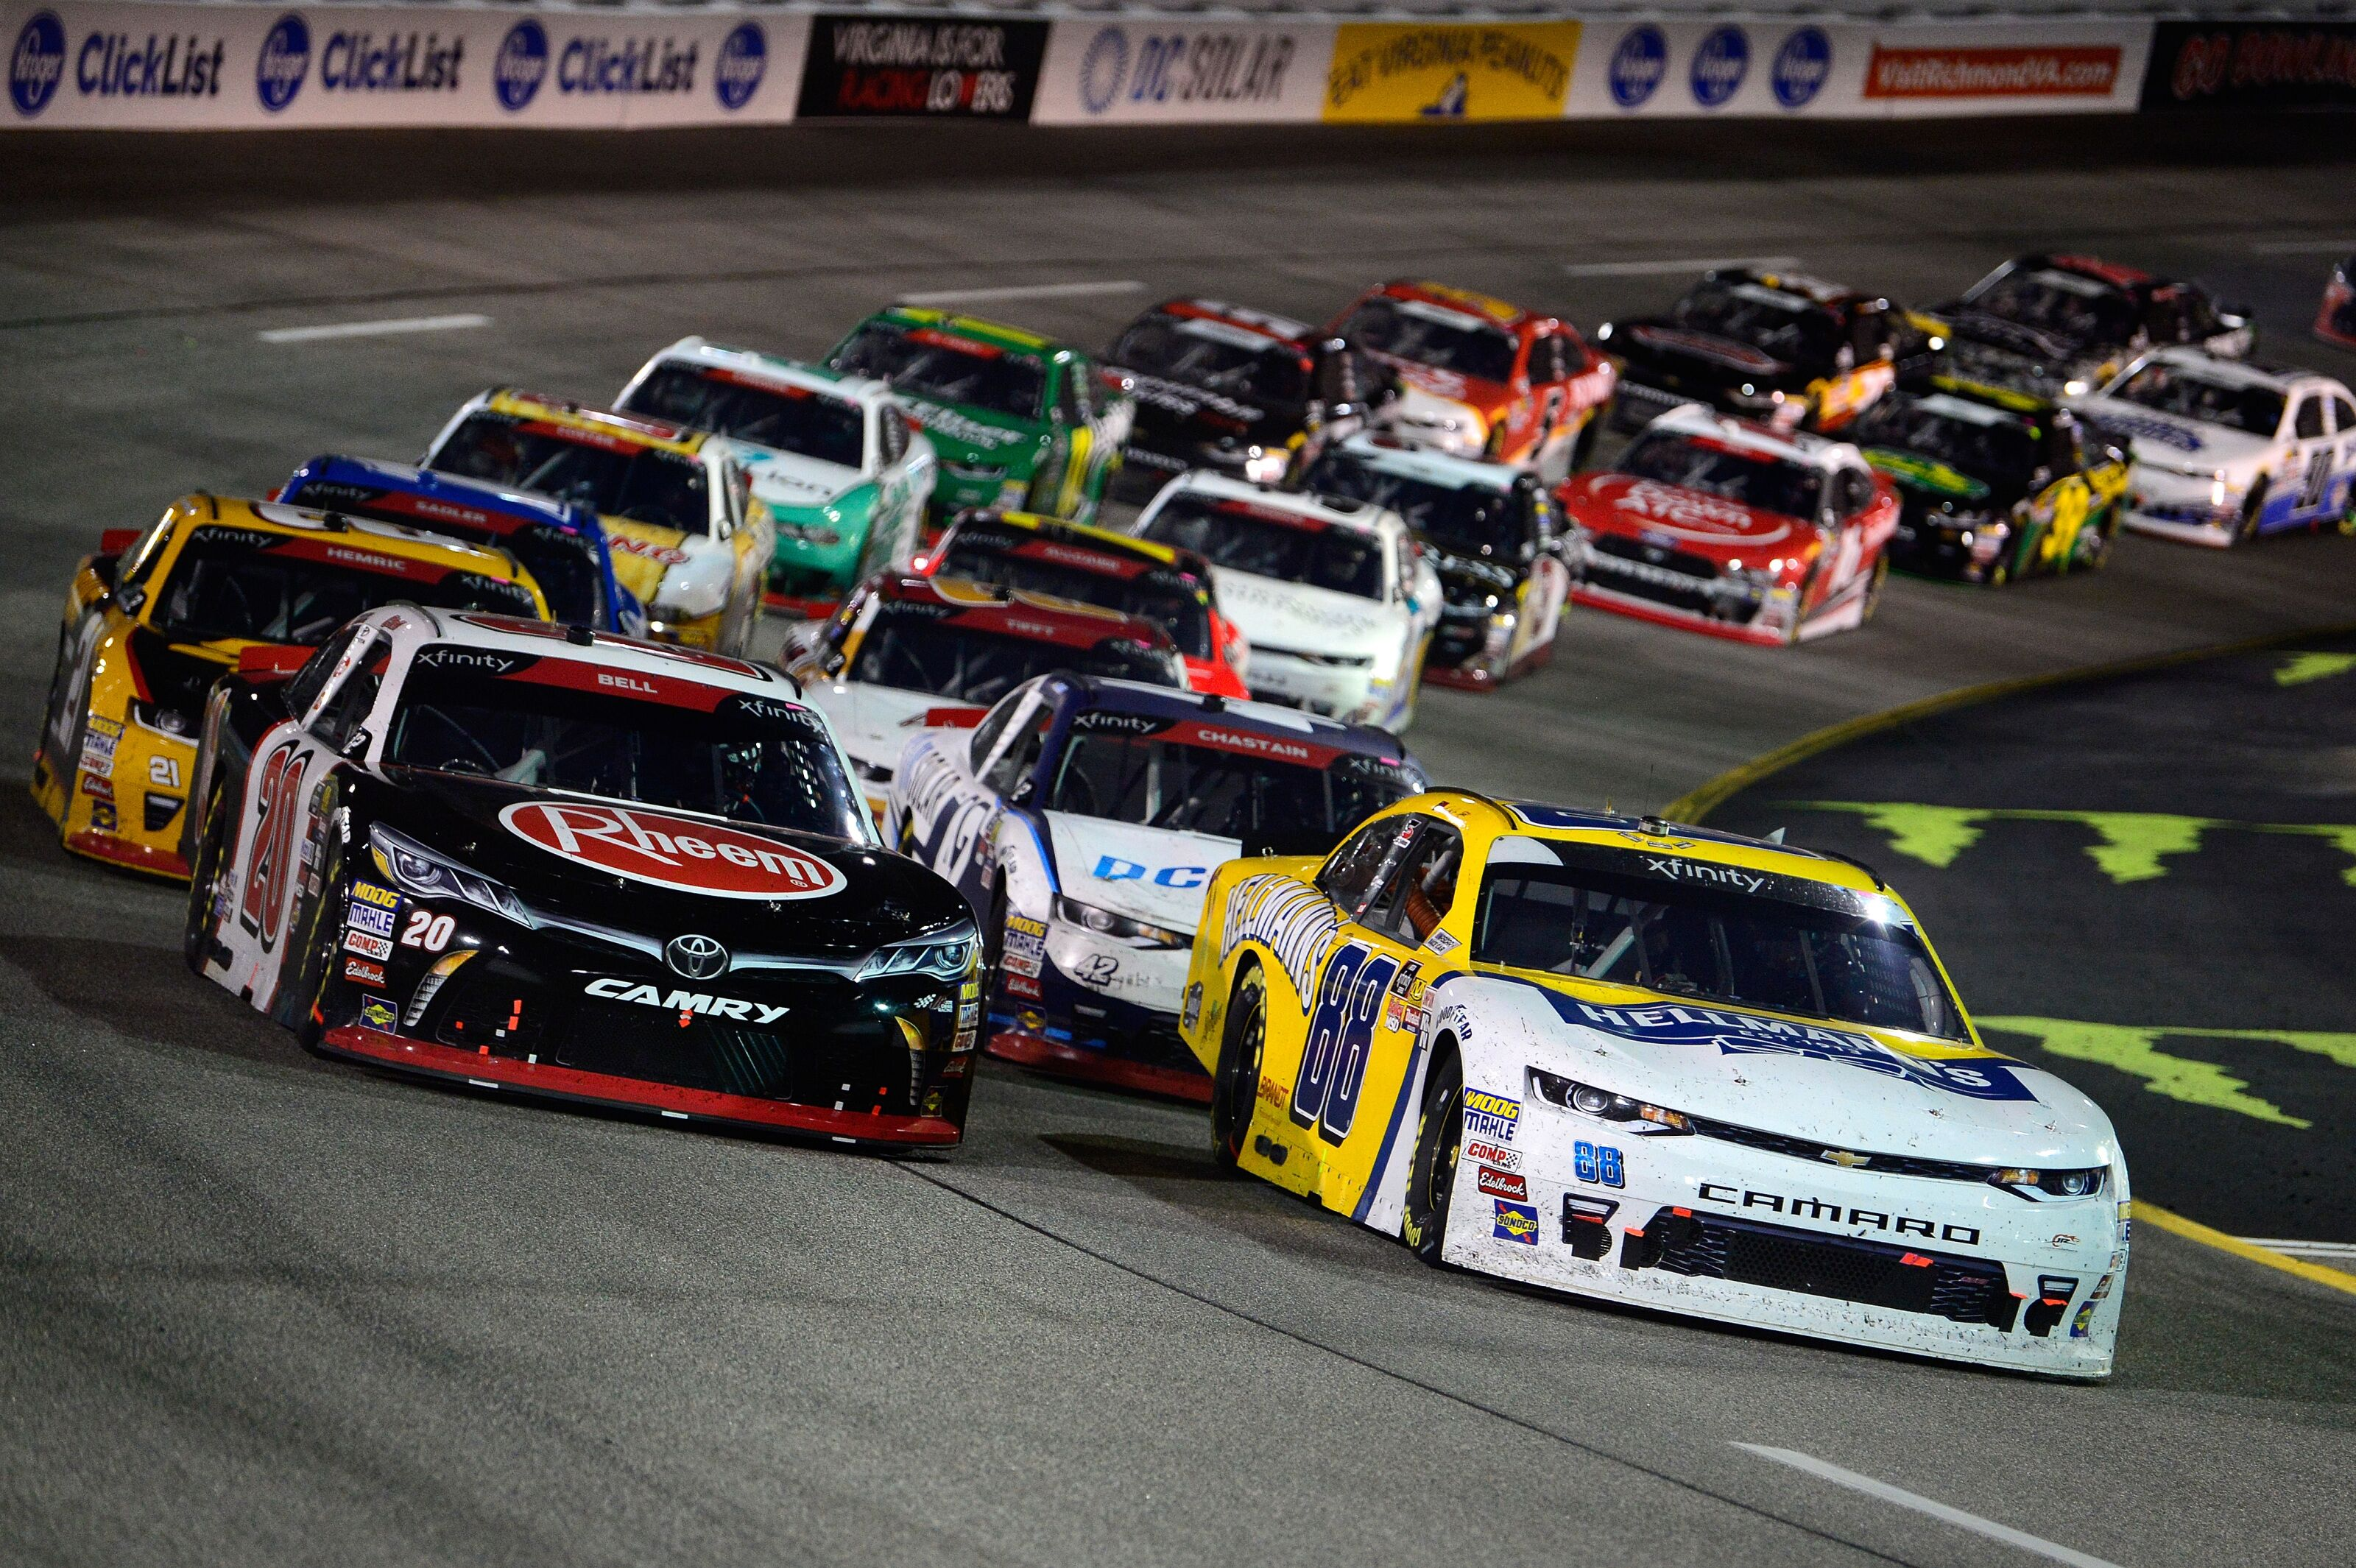 NASCAR Xfinity Series: 2019 playoff schedule